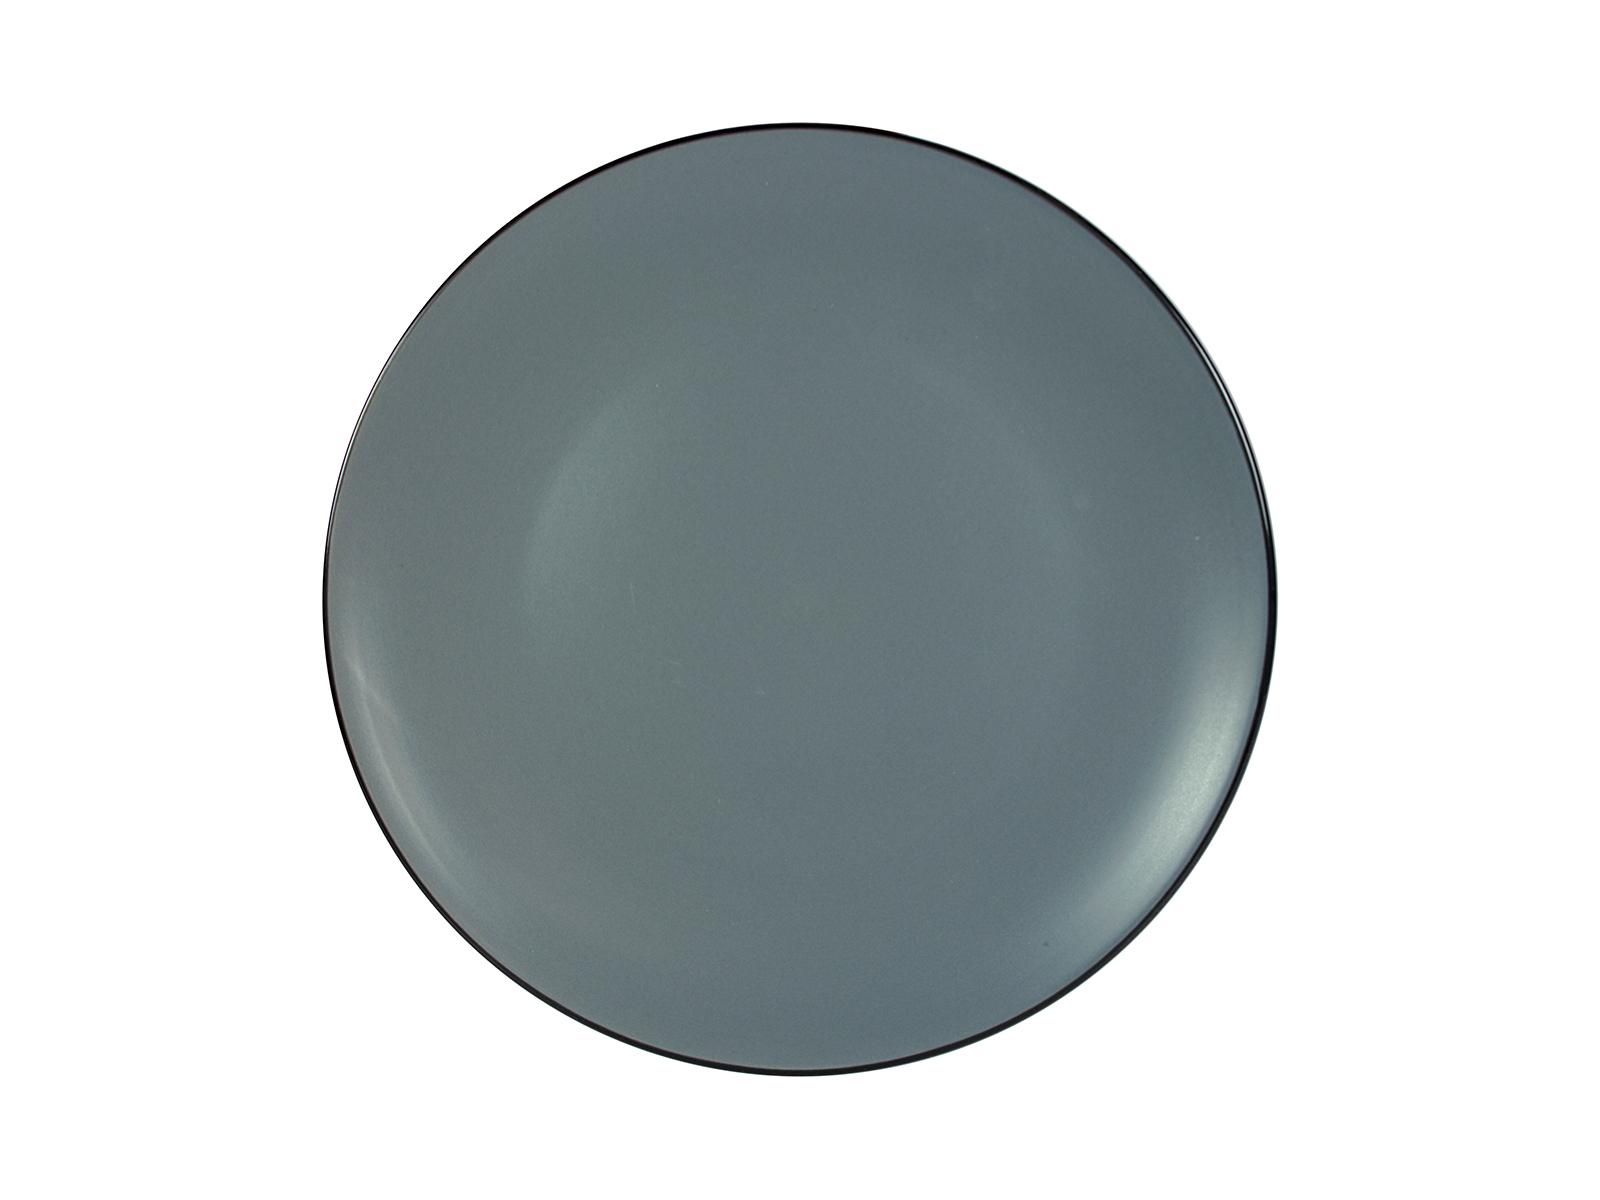 Тарелка SolidПосуда<br>Тарелка керамическая<br>